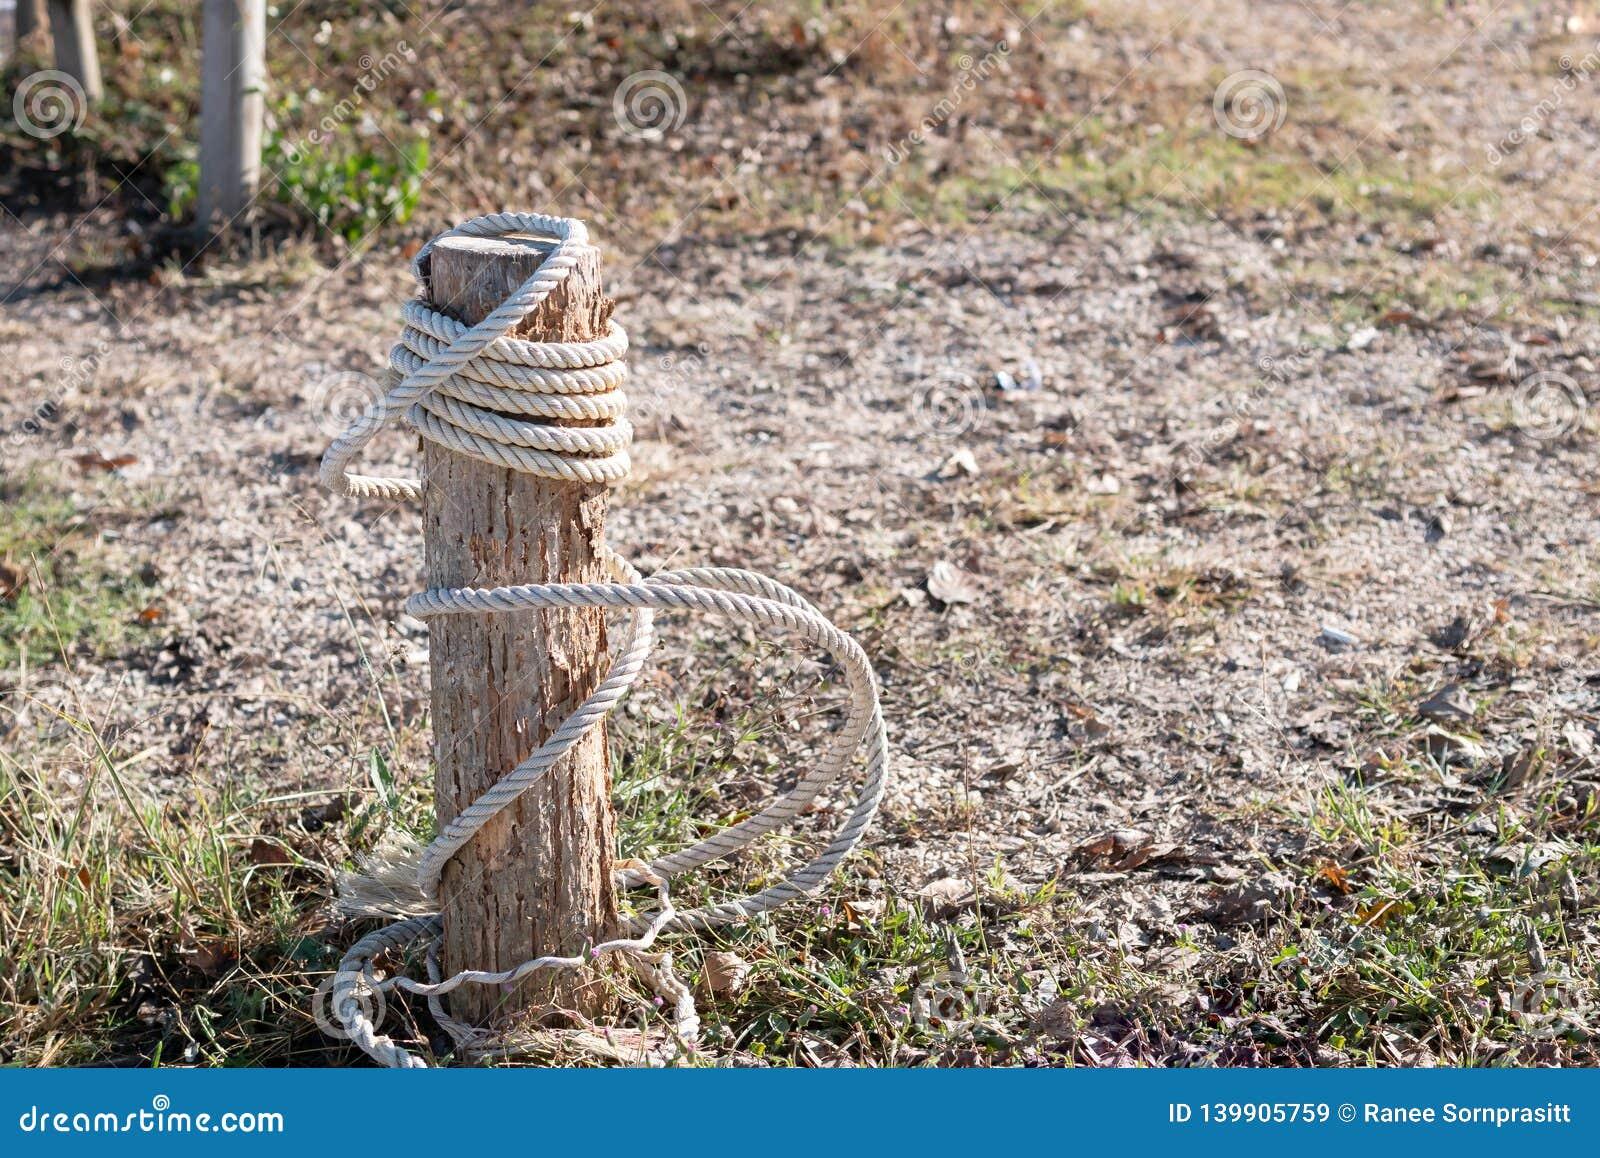 Corda branca amarrada com coto quebrado na terra